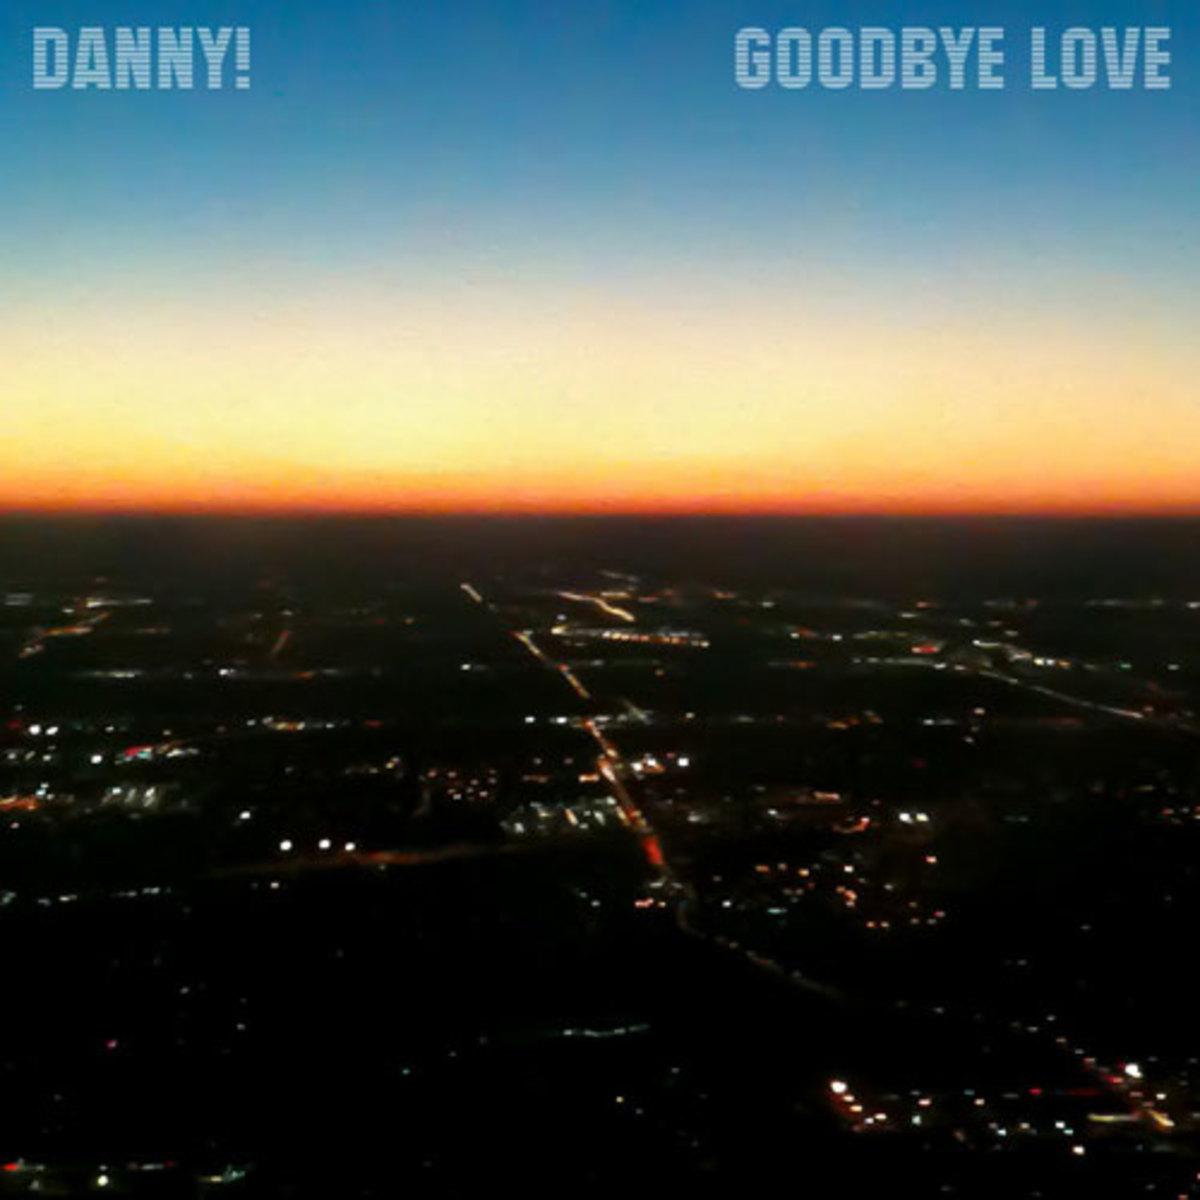 danny-goodbyelove.jpg